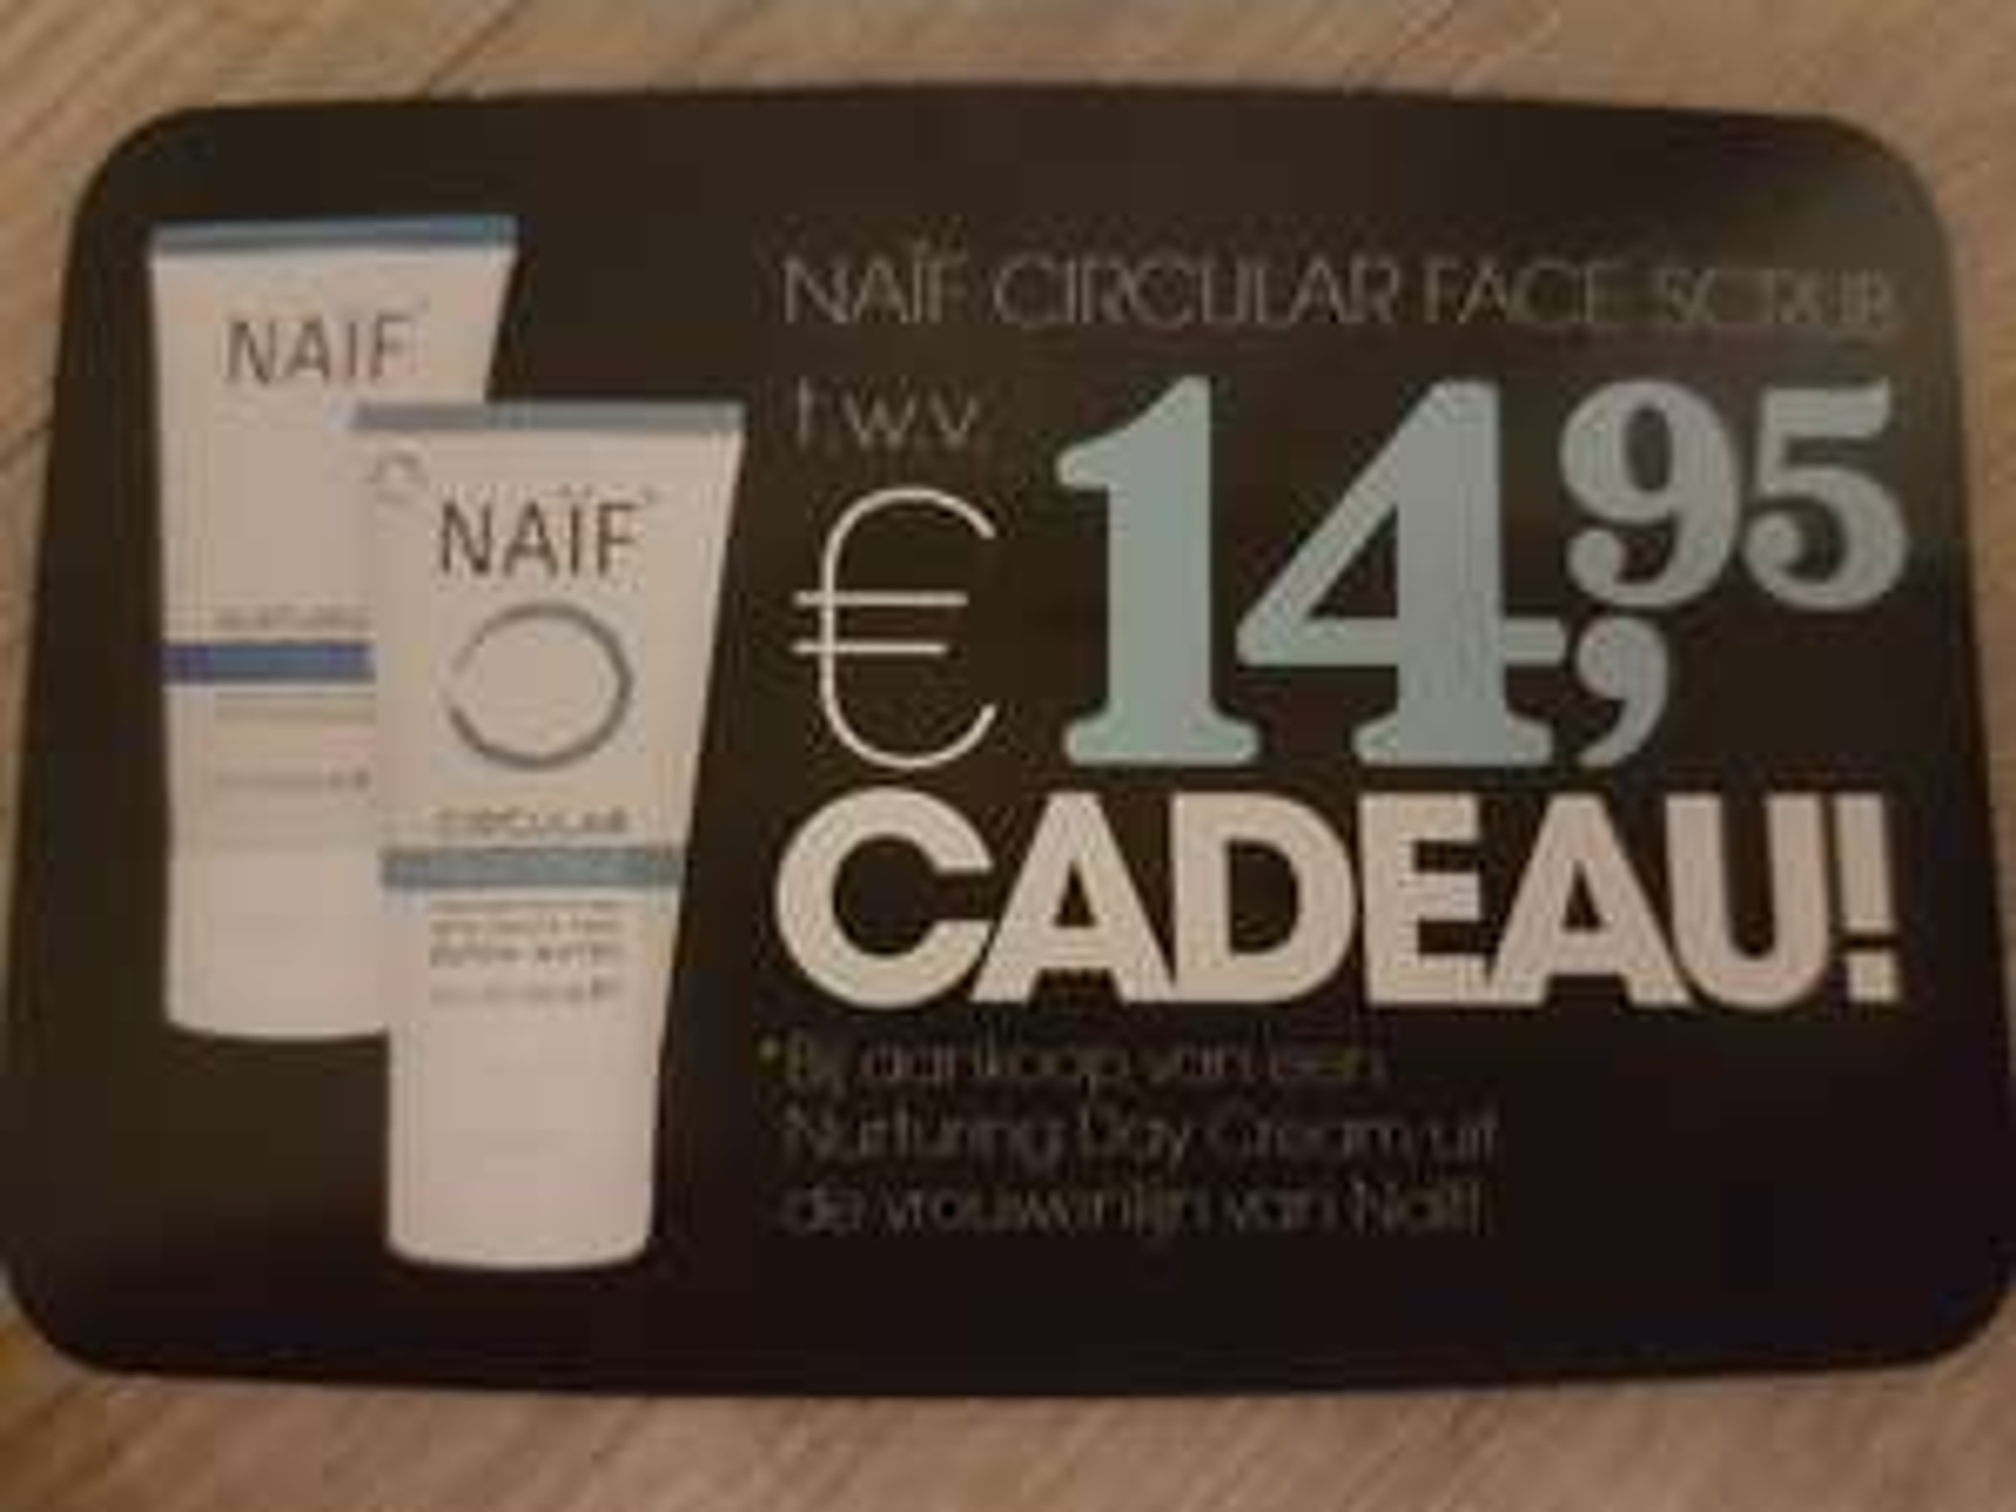 Gratis Naif Face Scrub à 14,95 bij aankoop dagcreme (à 22,95)